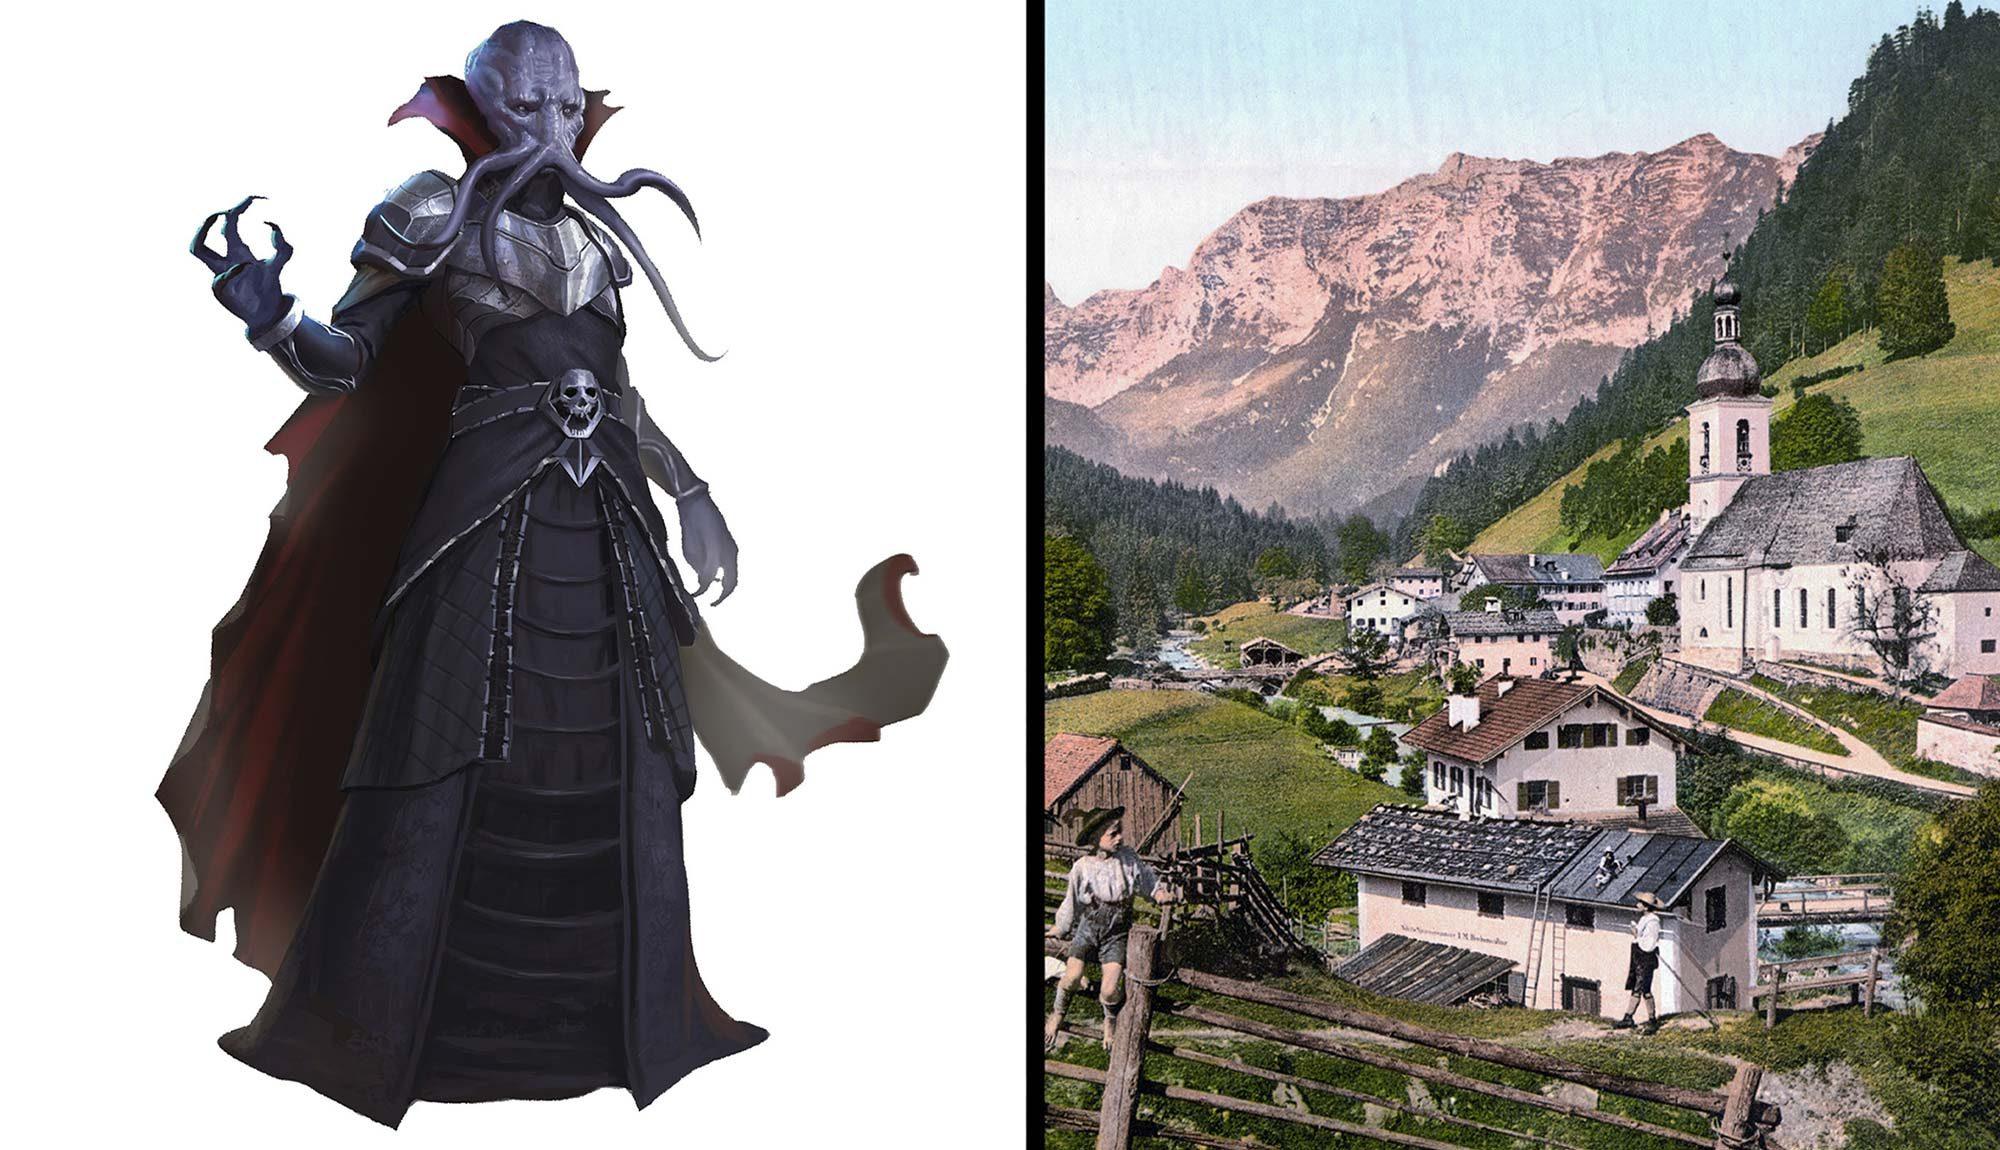 QUIZ: DnD Monster or Quaint European Village? - Skybound Entertainment